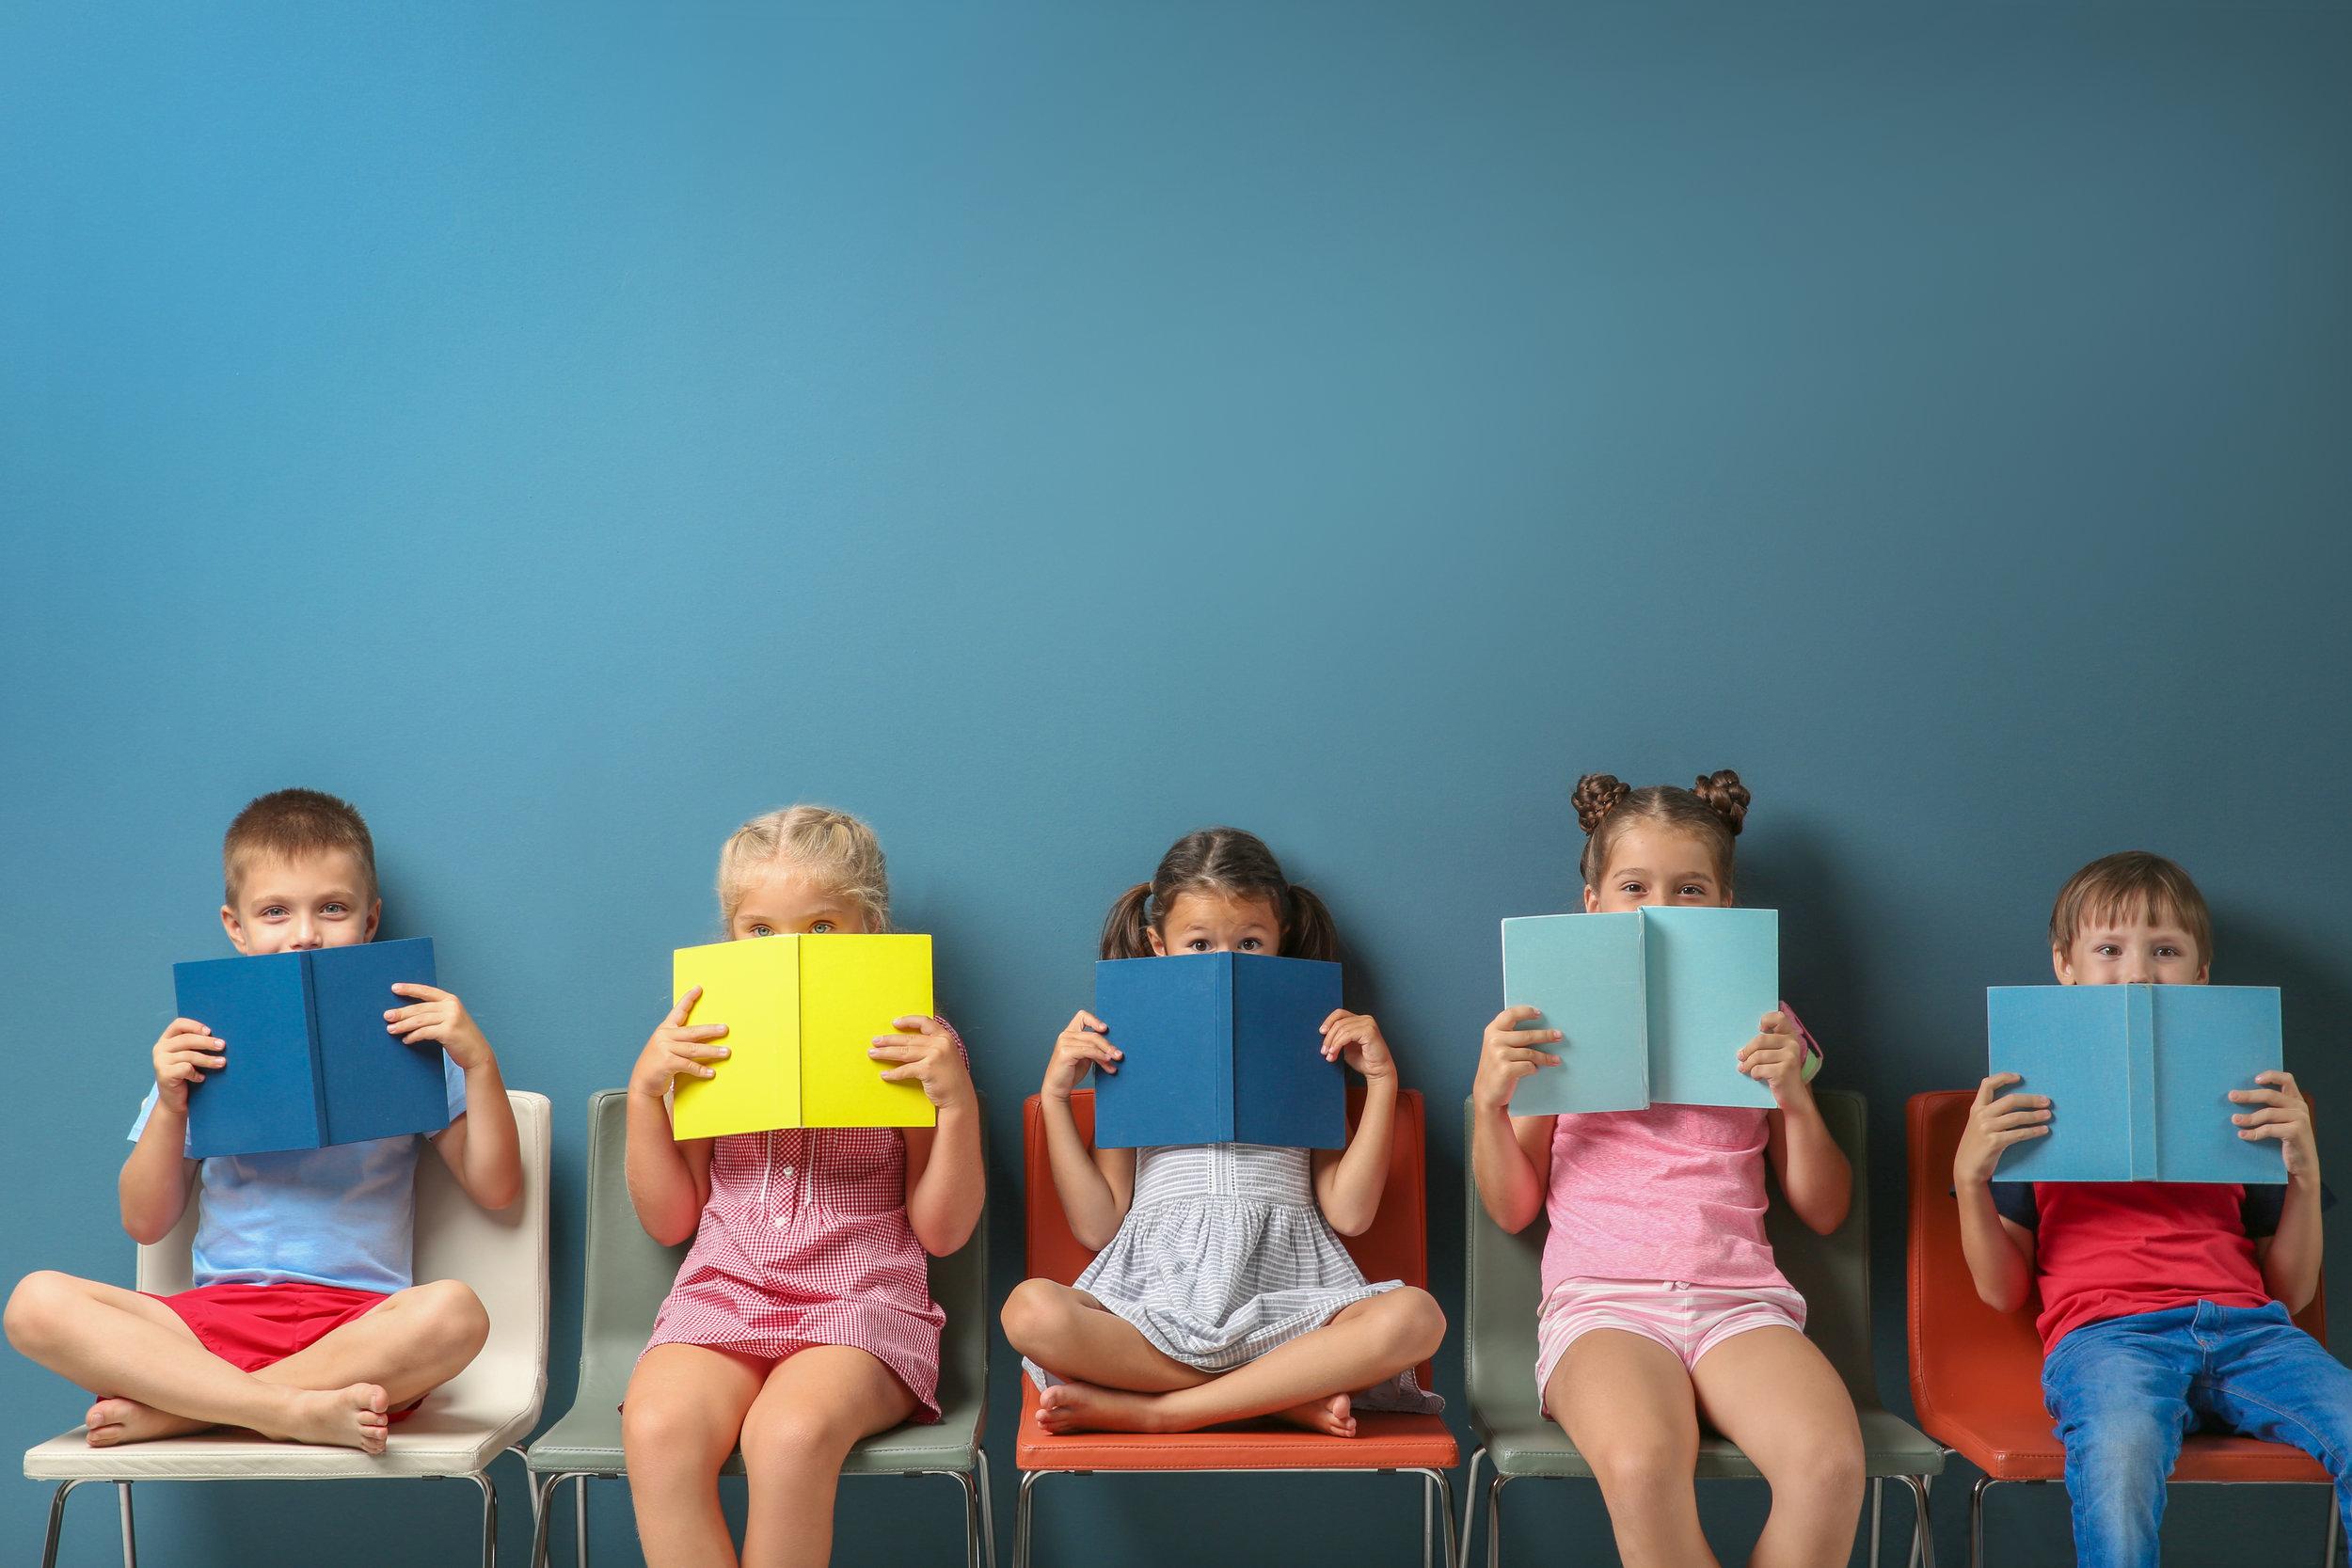 kidsbooks.jpeg